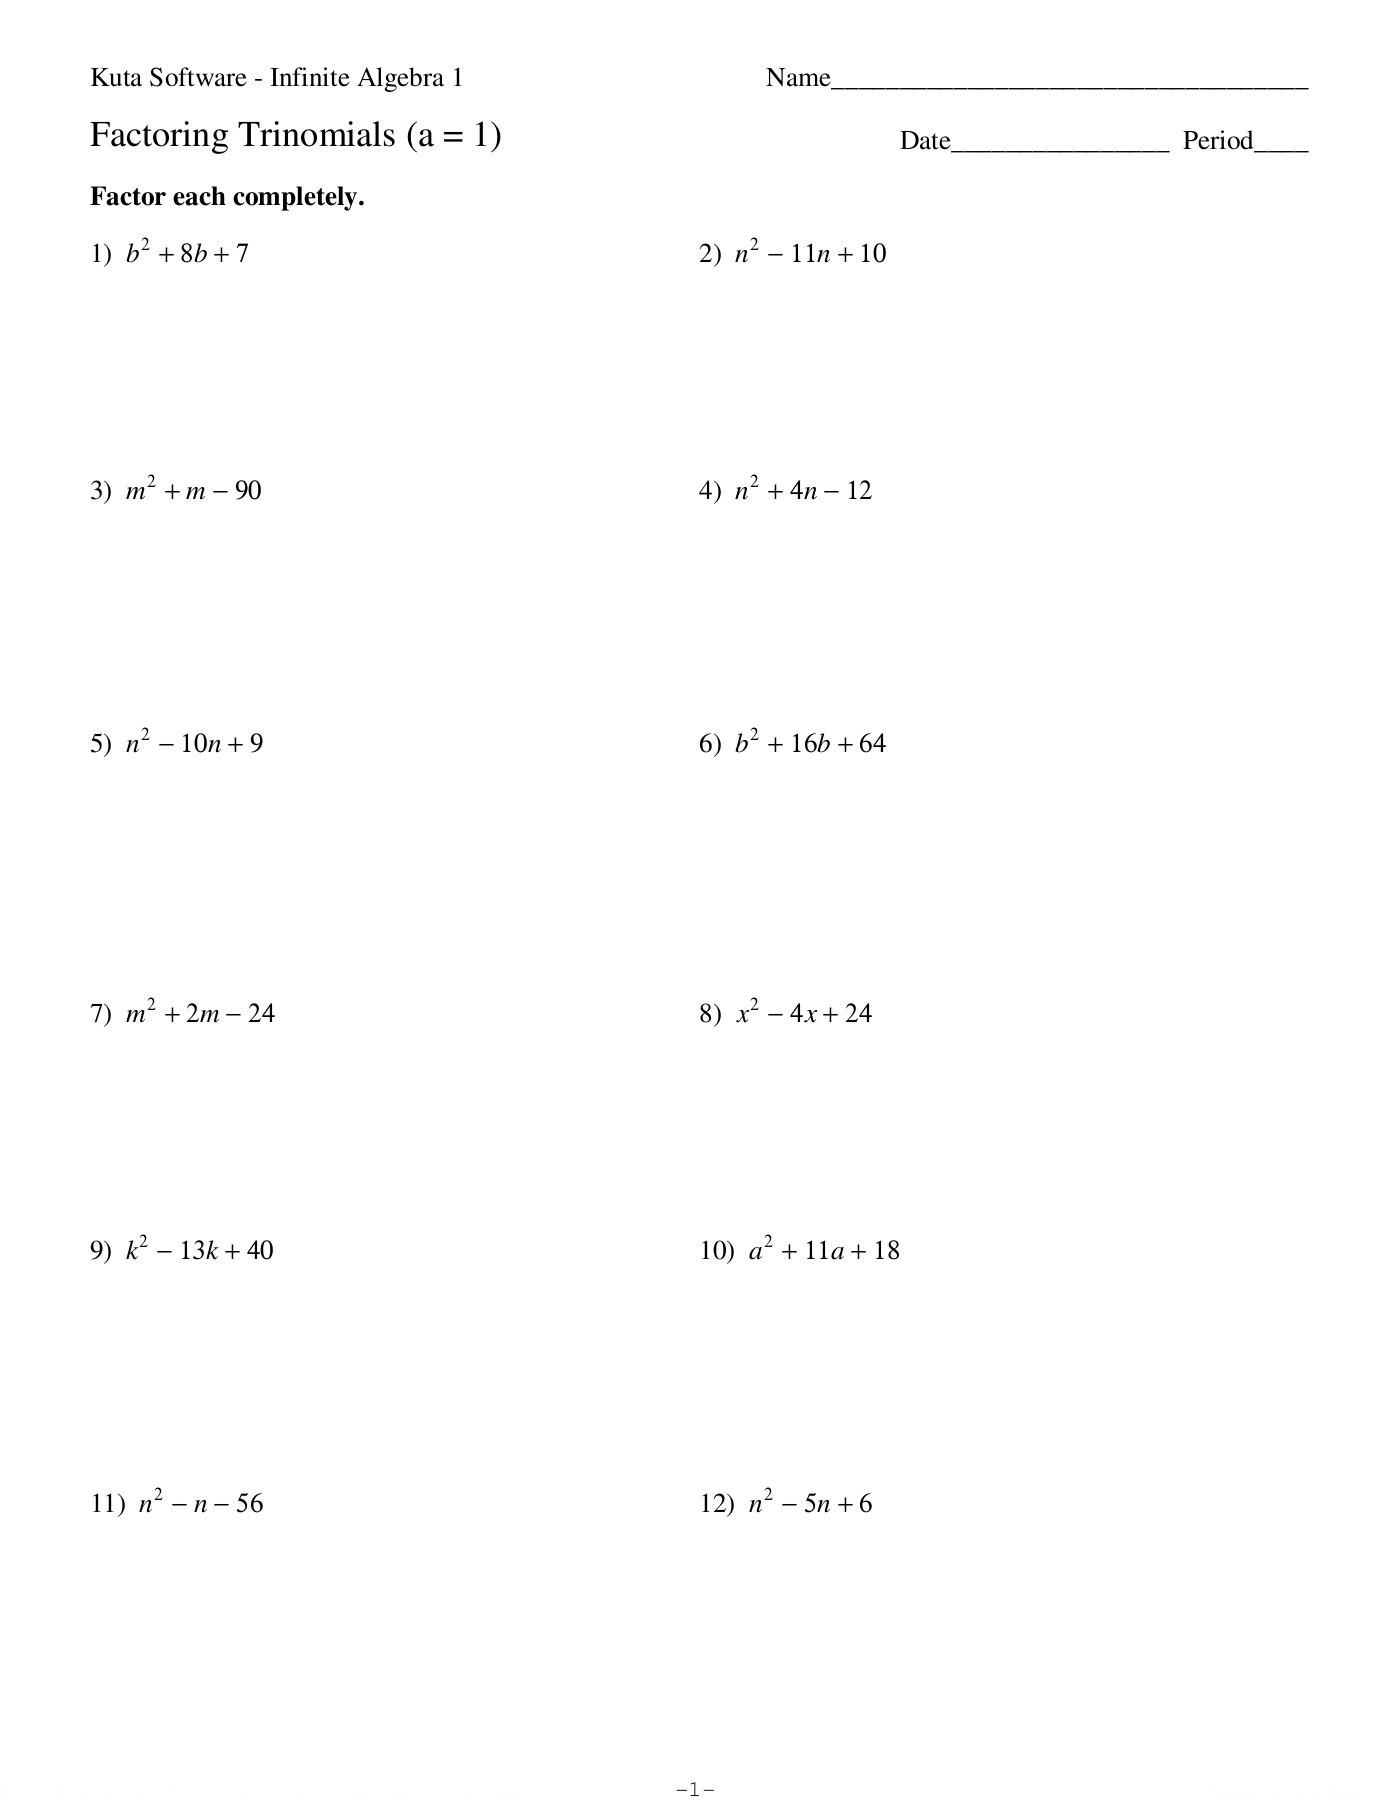 Factoring Trinomials A 1 Worksheet Factoring Trinomials A = 1 Date Period Kuta software Llc